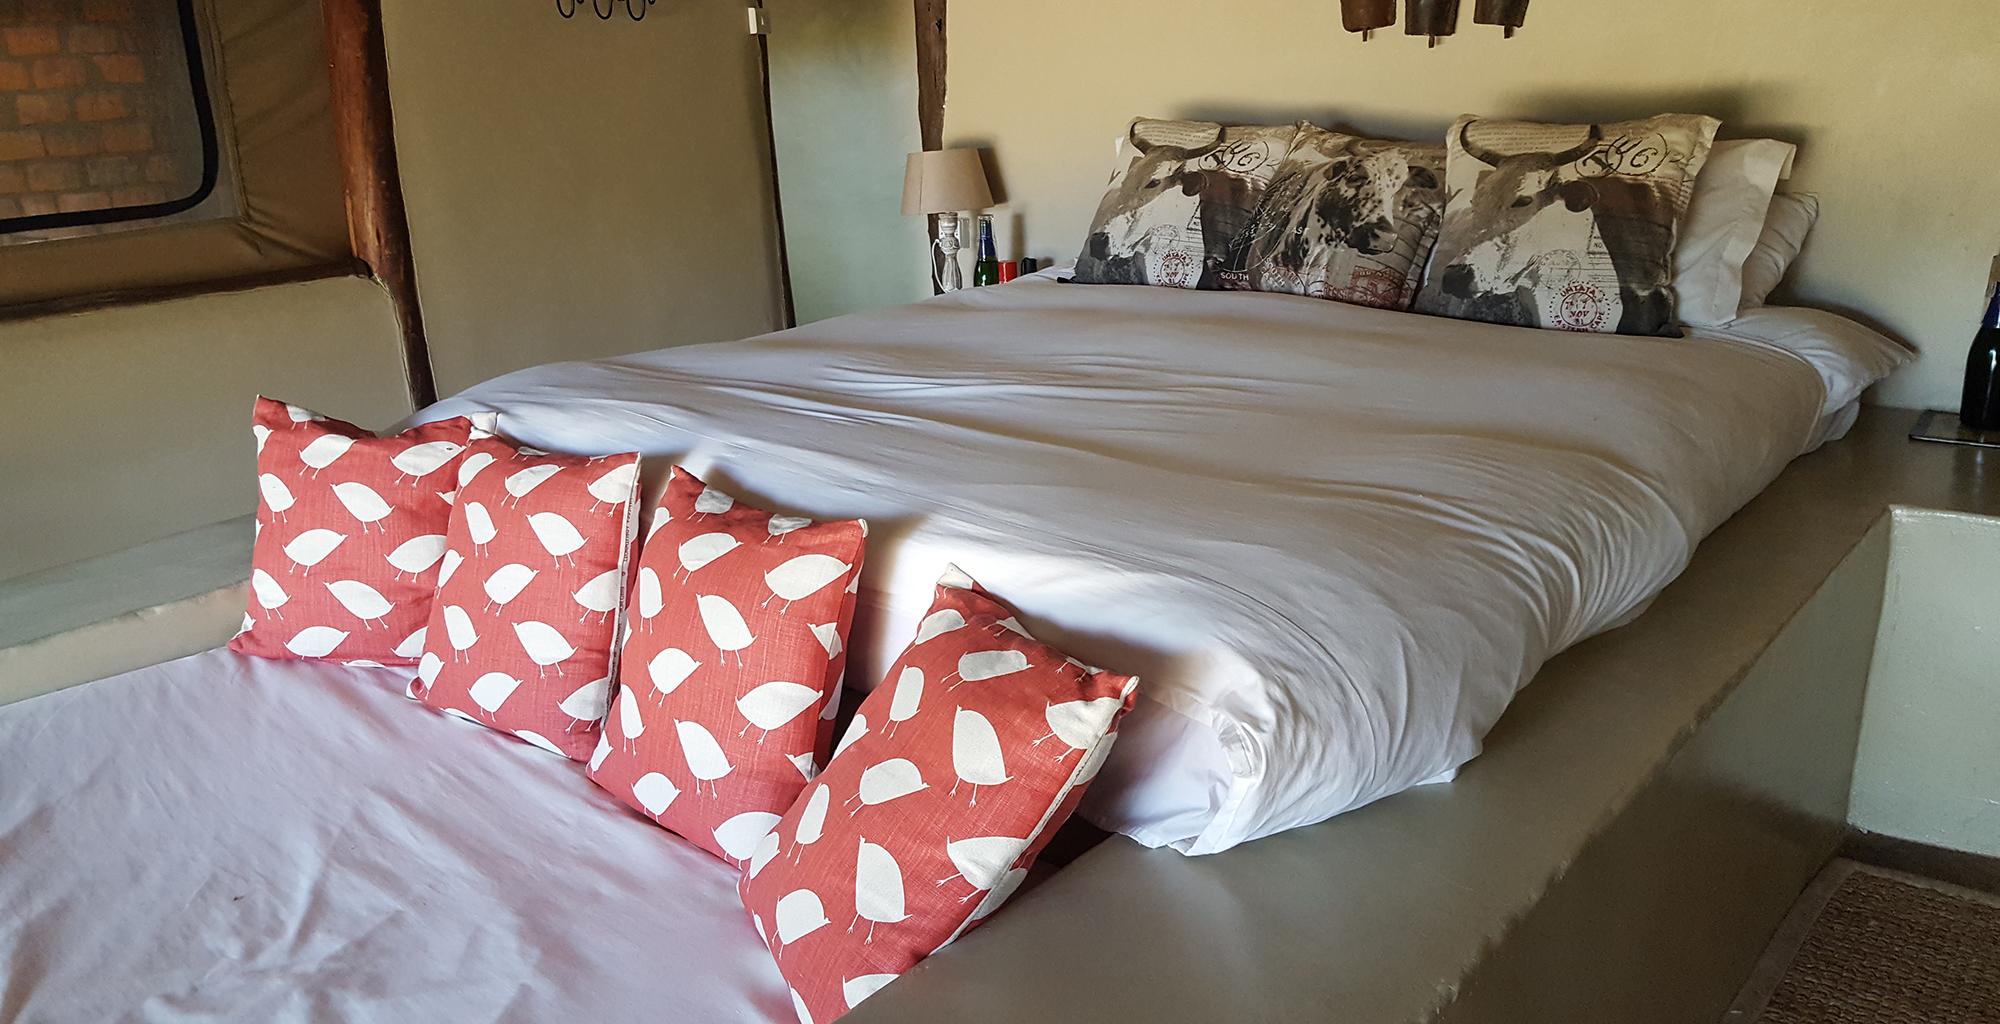 Kenya-Houses-In-The-Wild-Bedroom